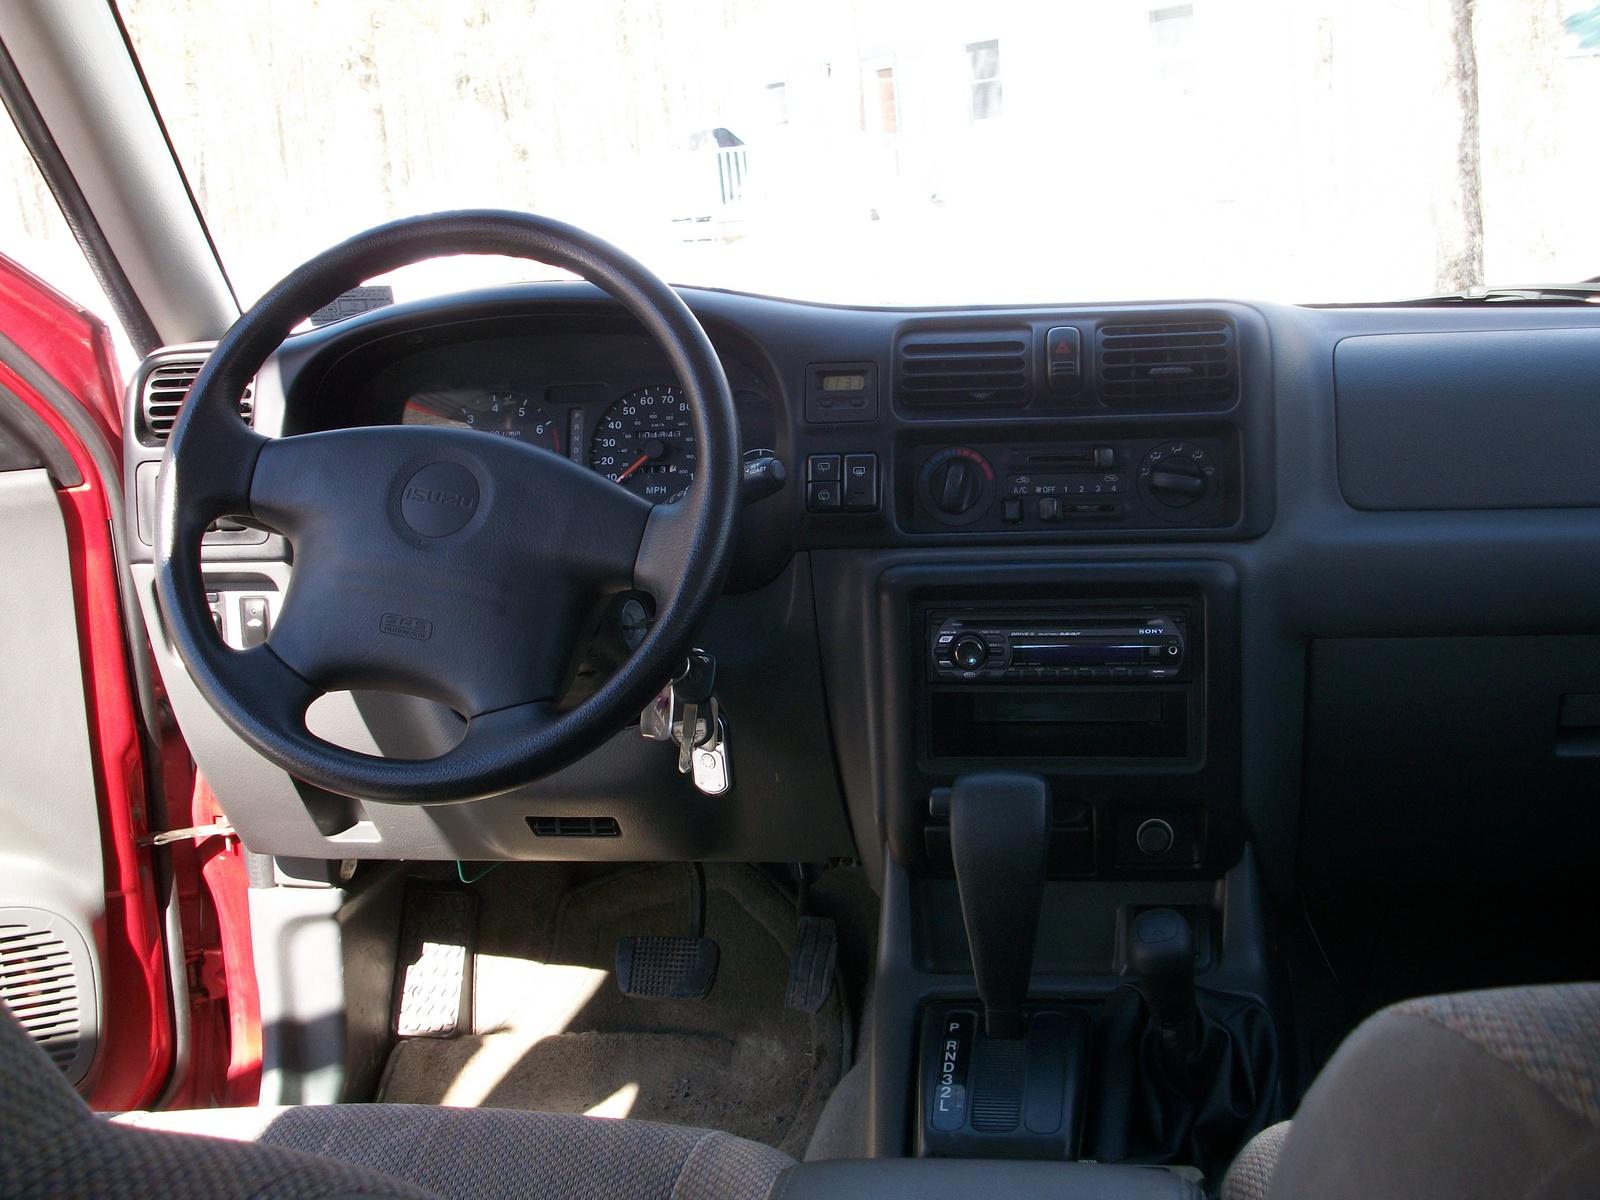 Isuzu Rodeo II 1998 - 2004 SUV #6